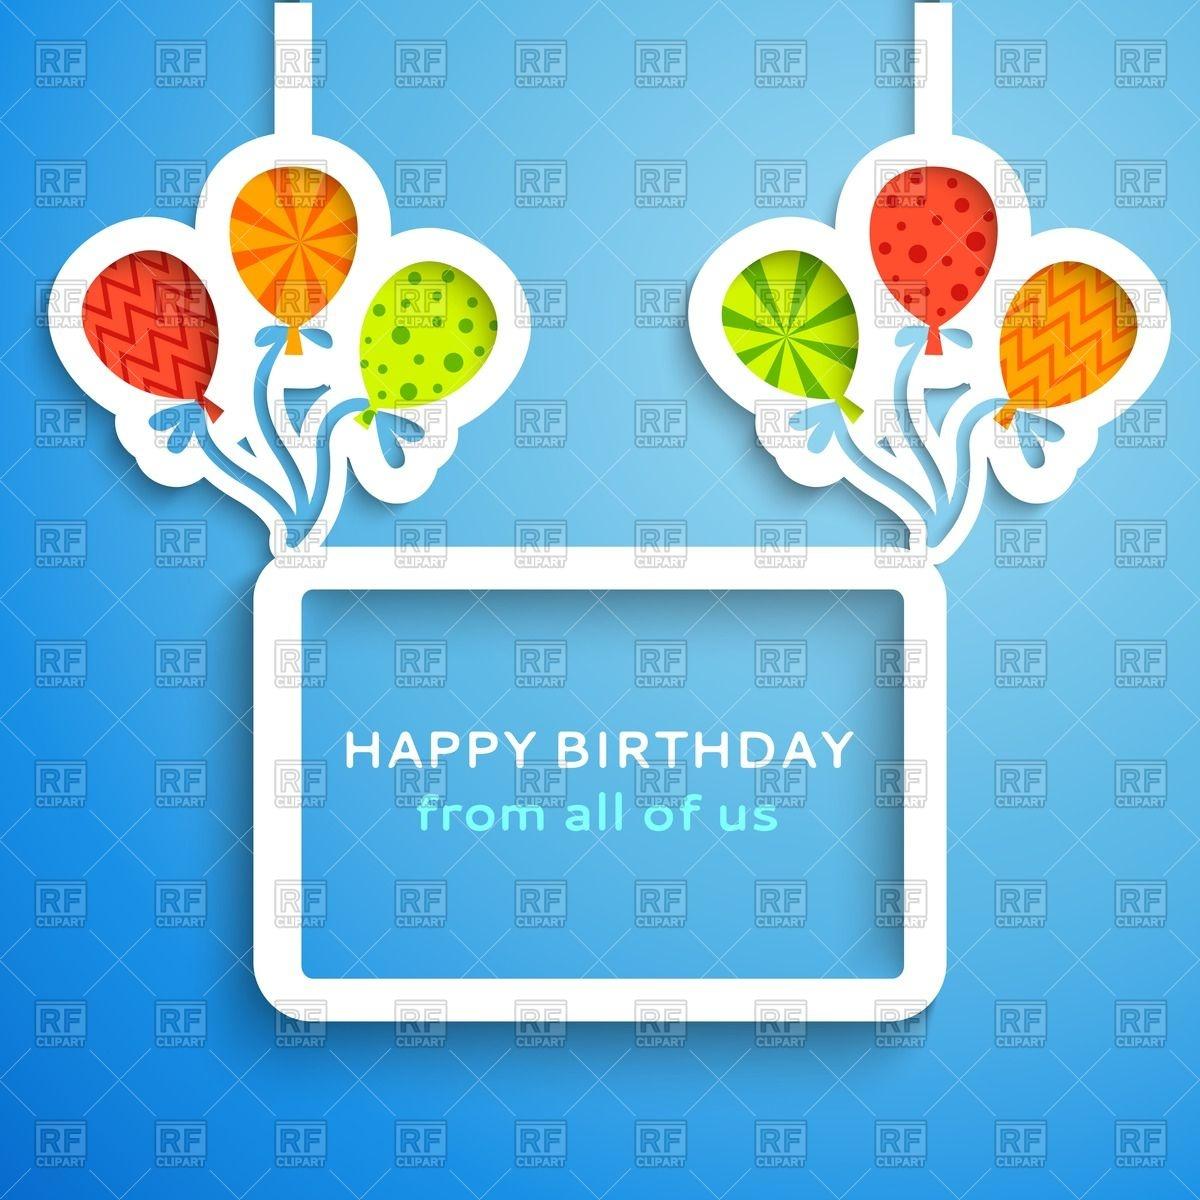 Happy Birthday Frame Clipart - Clipart Kid